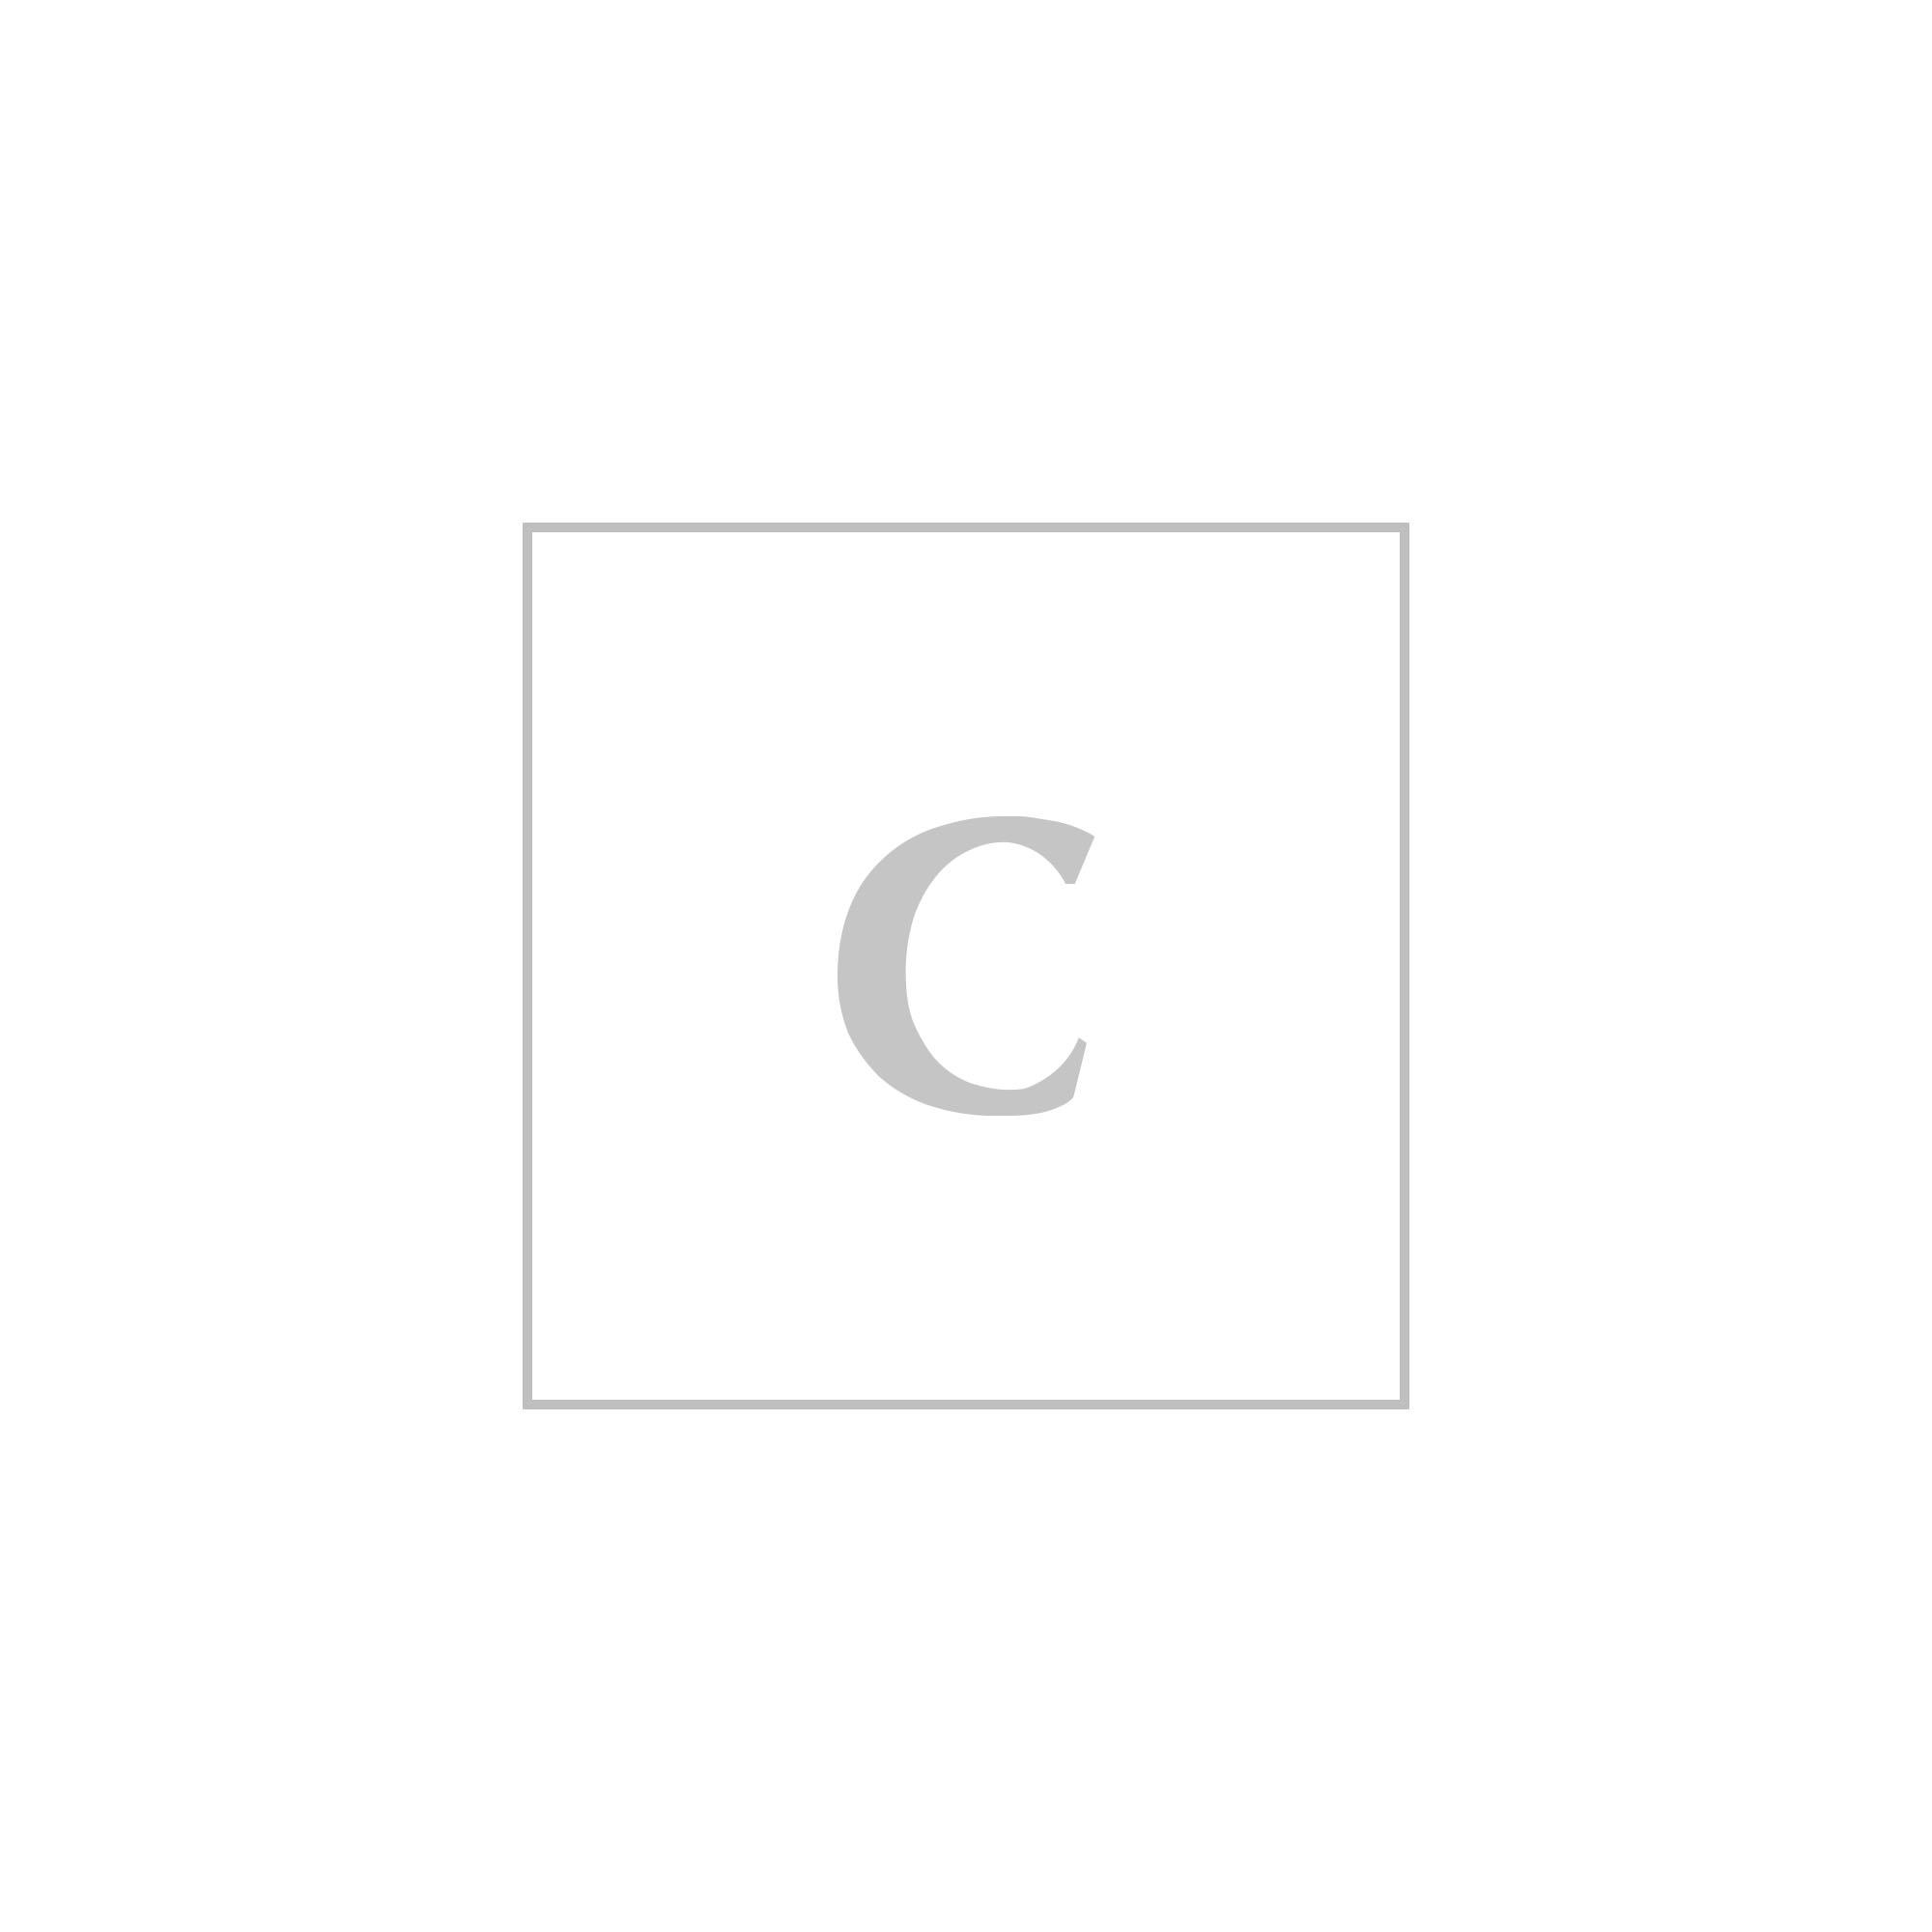 Stella mccartney falabella clutch